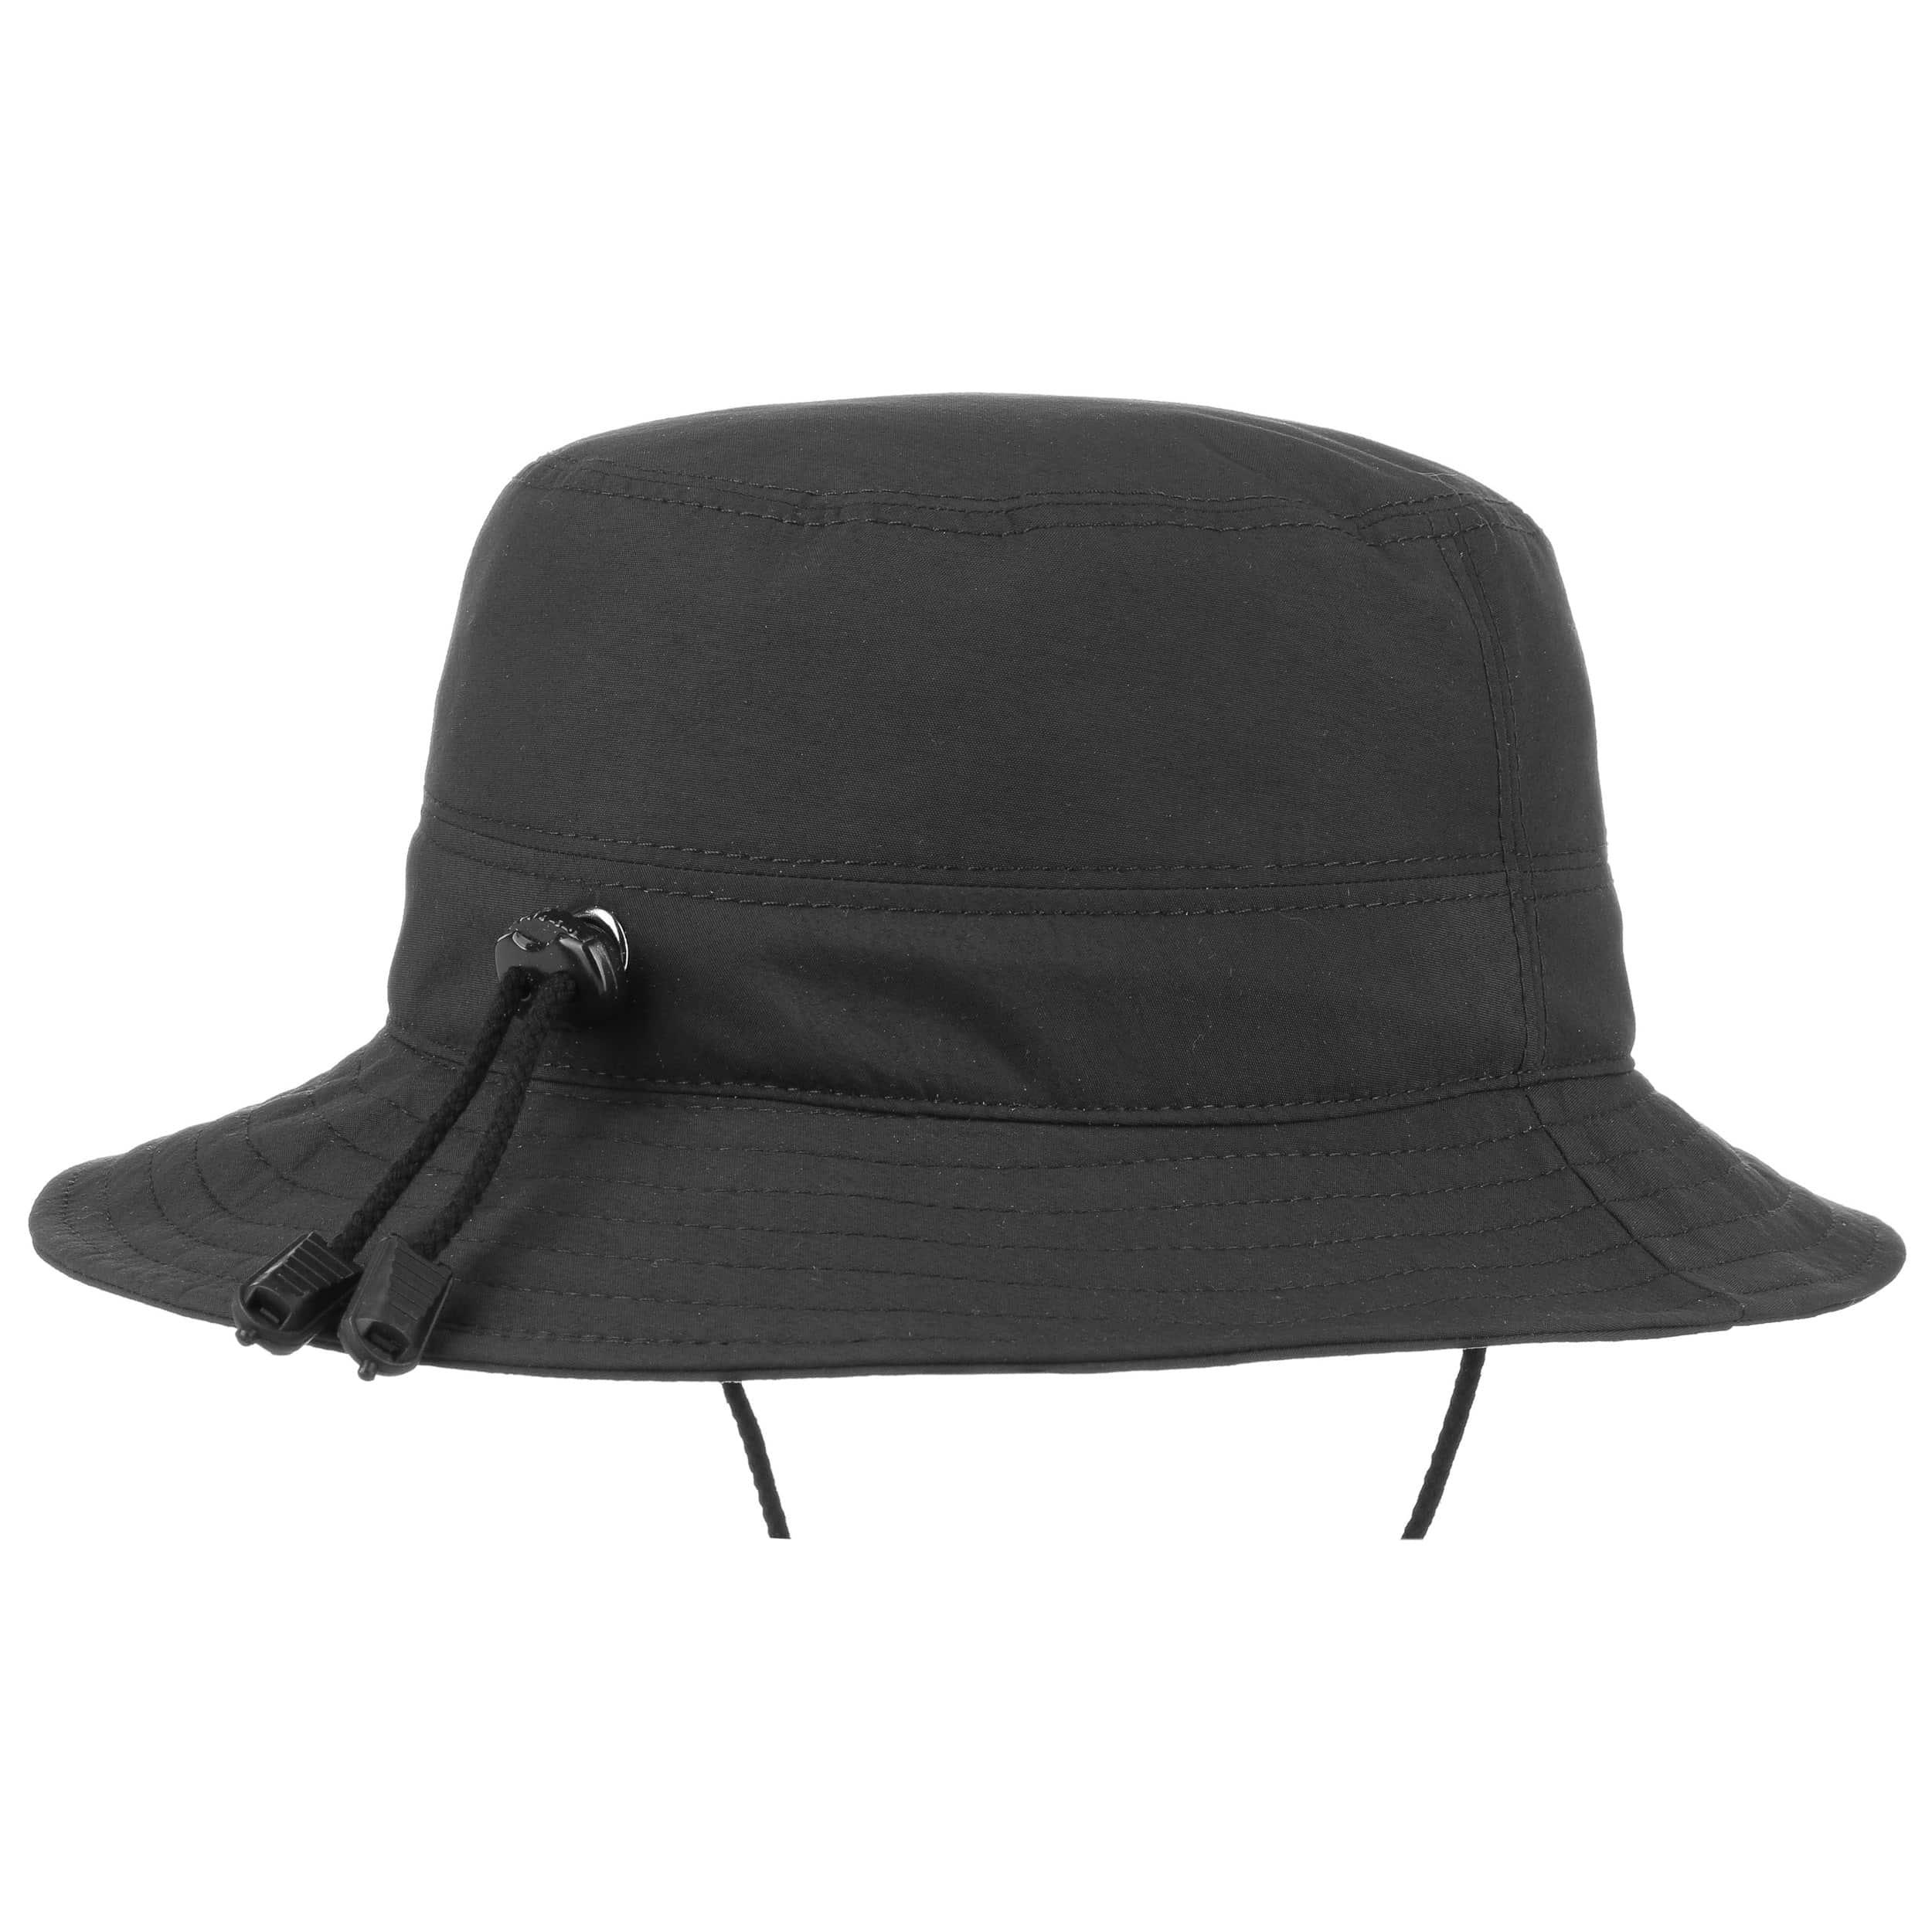 84bf7ac62c61b ... Gore-Tex Bucket Rain Hat by Lierys - black 3 ...